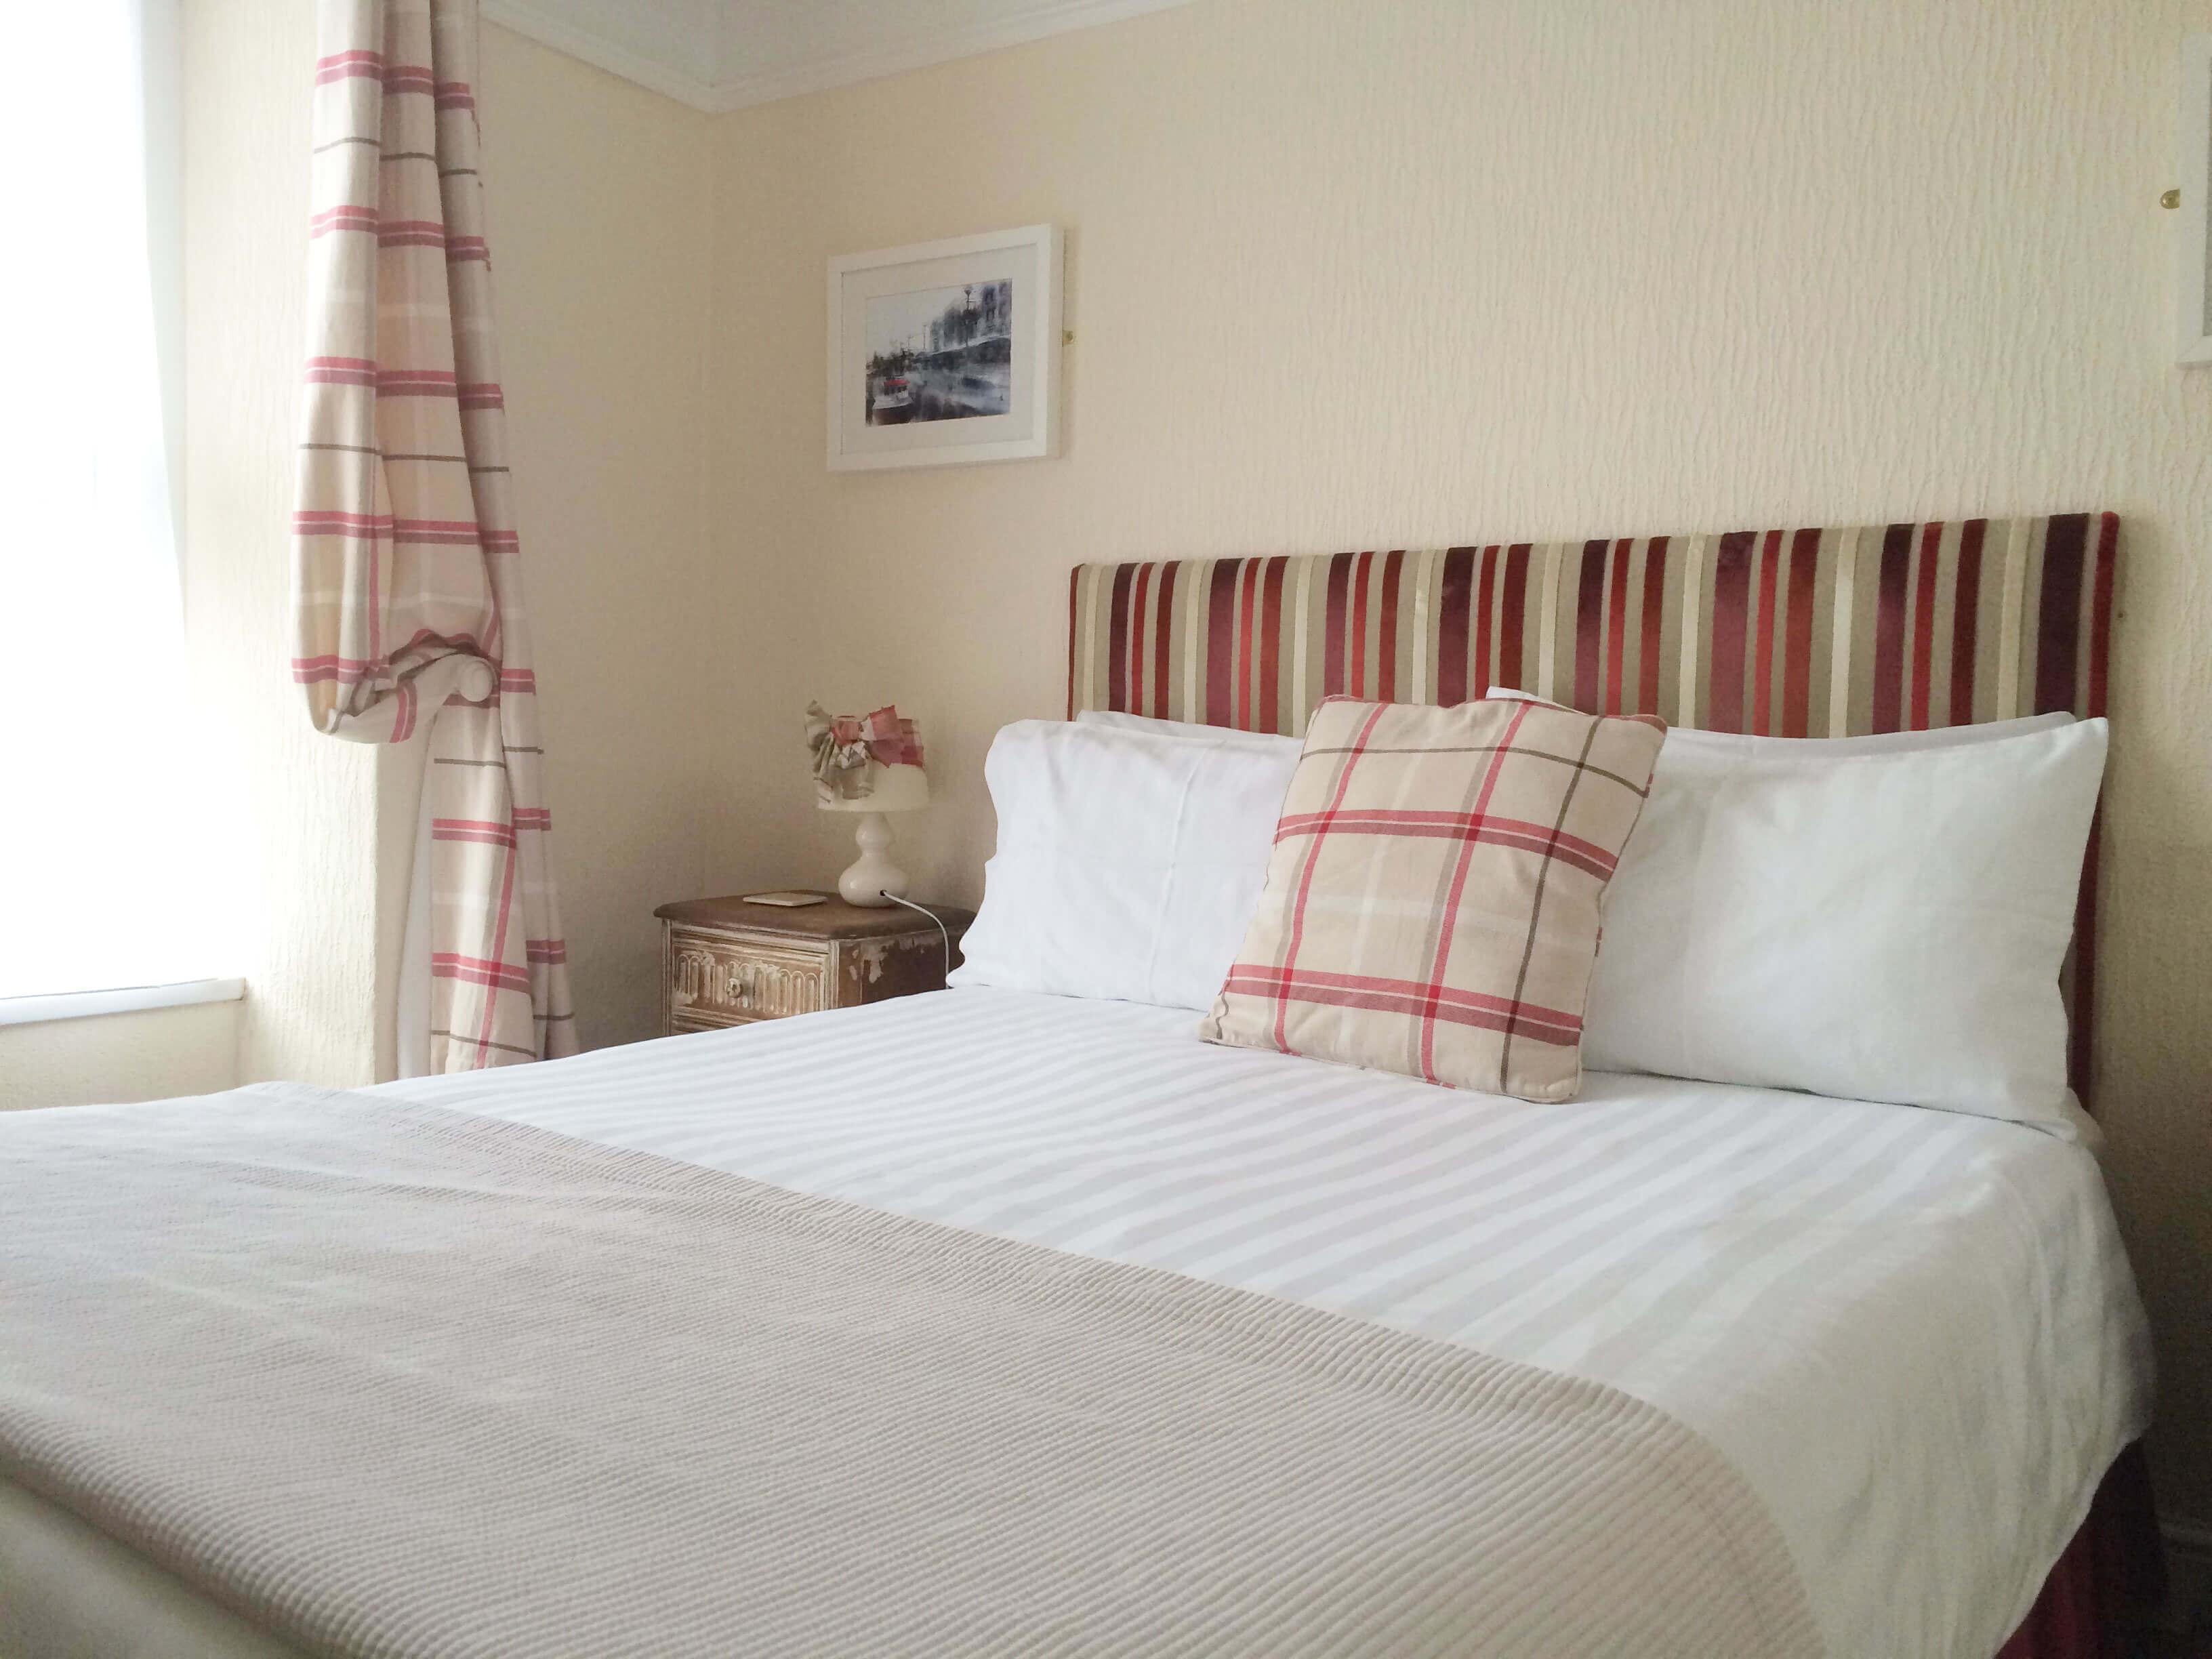 The Phantele Bed & Breakfast - Image 3 - UK Tourism Online